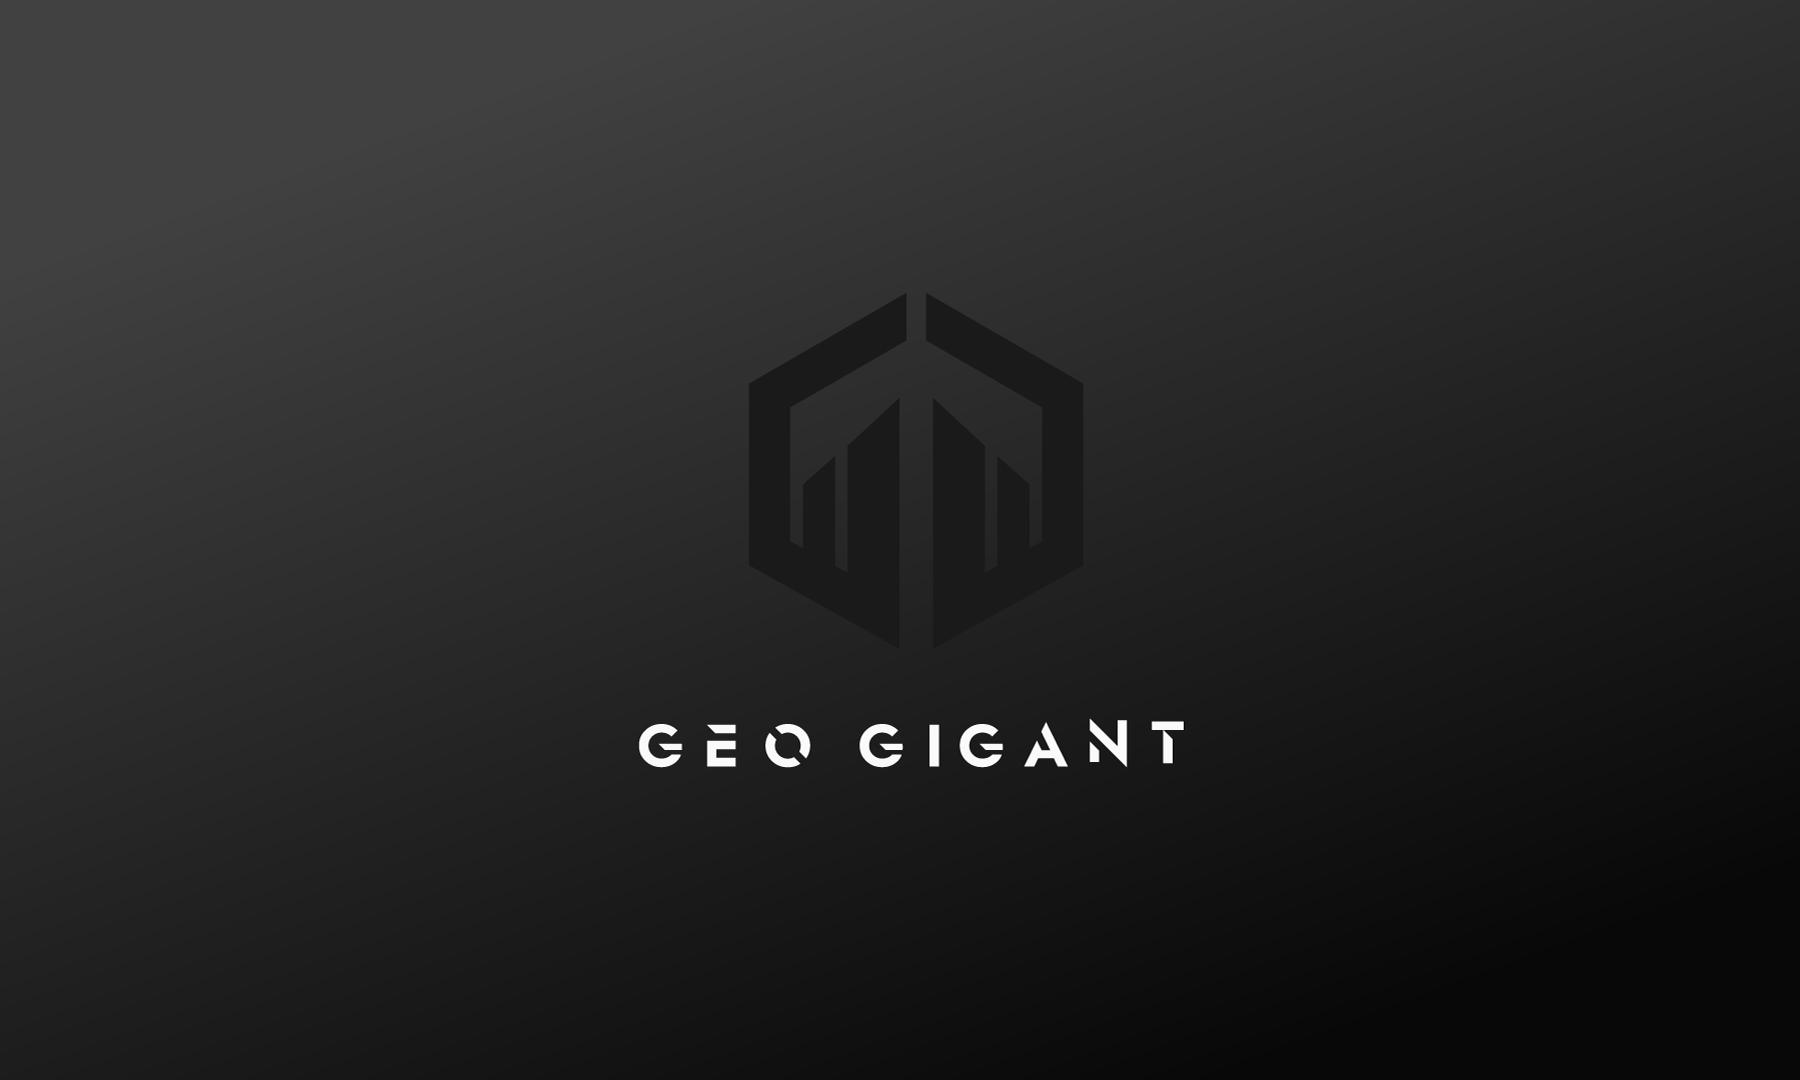 Izrada dizajn_Logotipa_Slavonski_Brod_Geo_Gigant